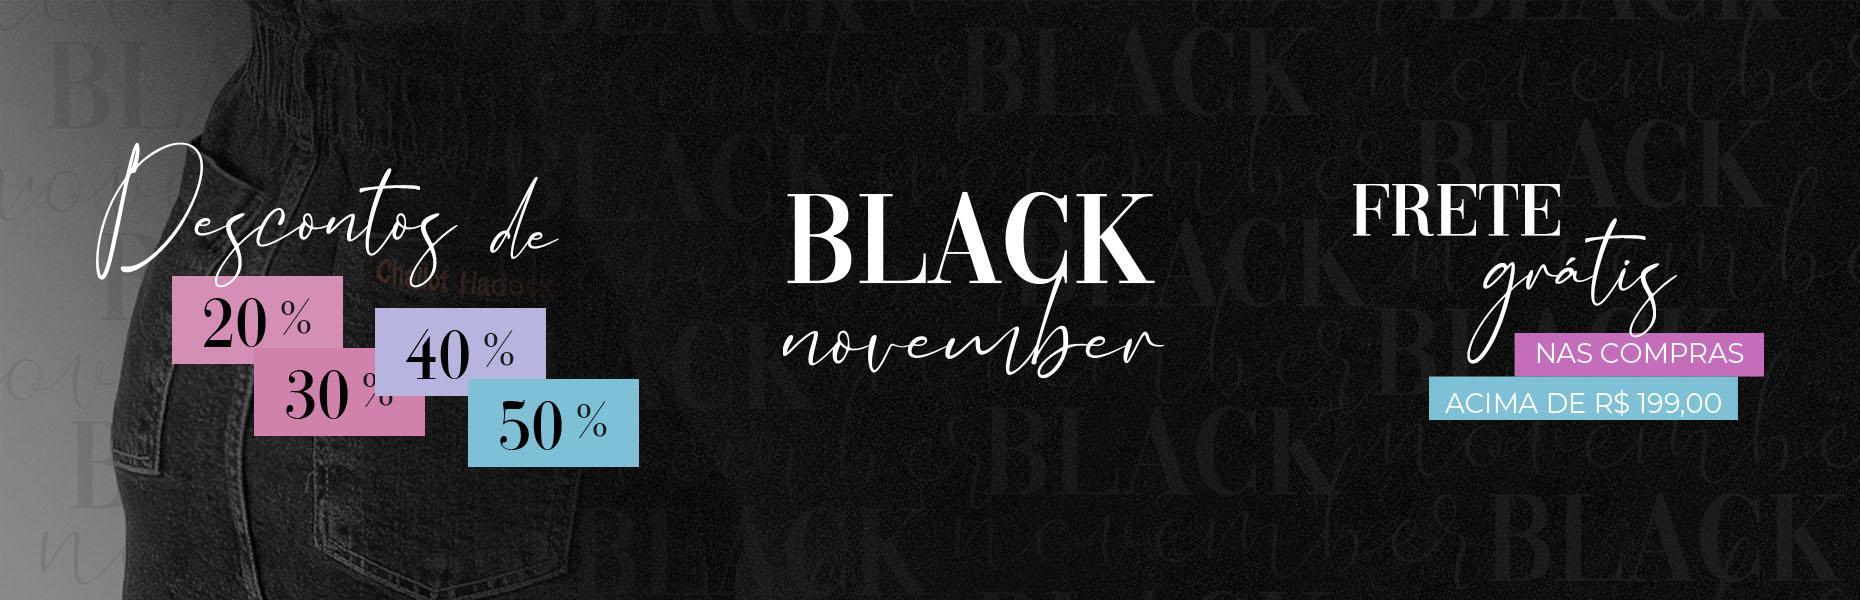 Black November - Challot Hadock